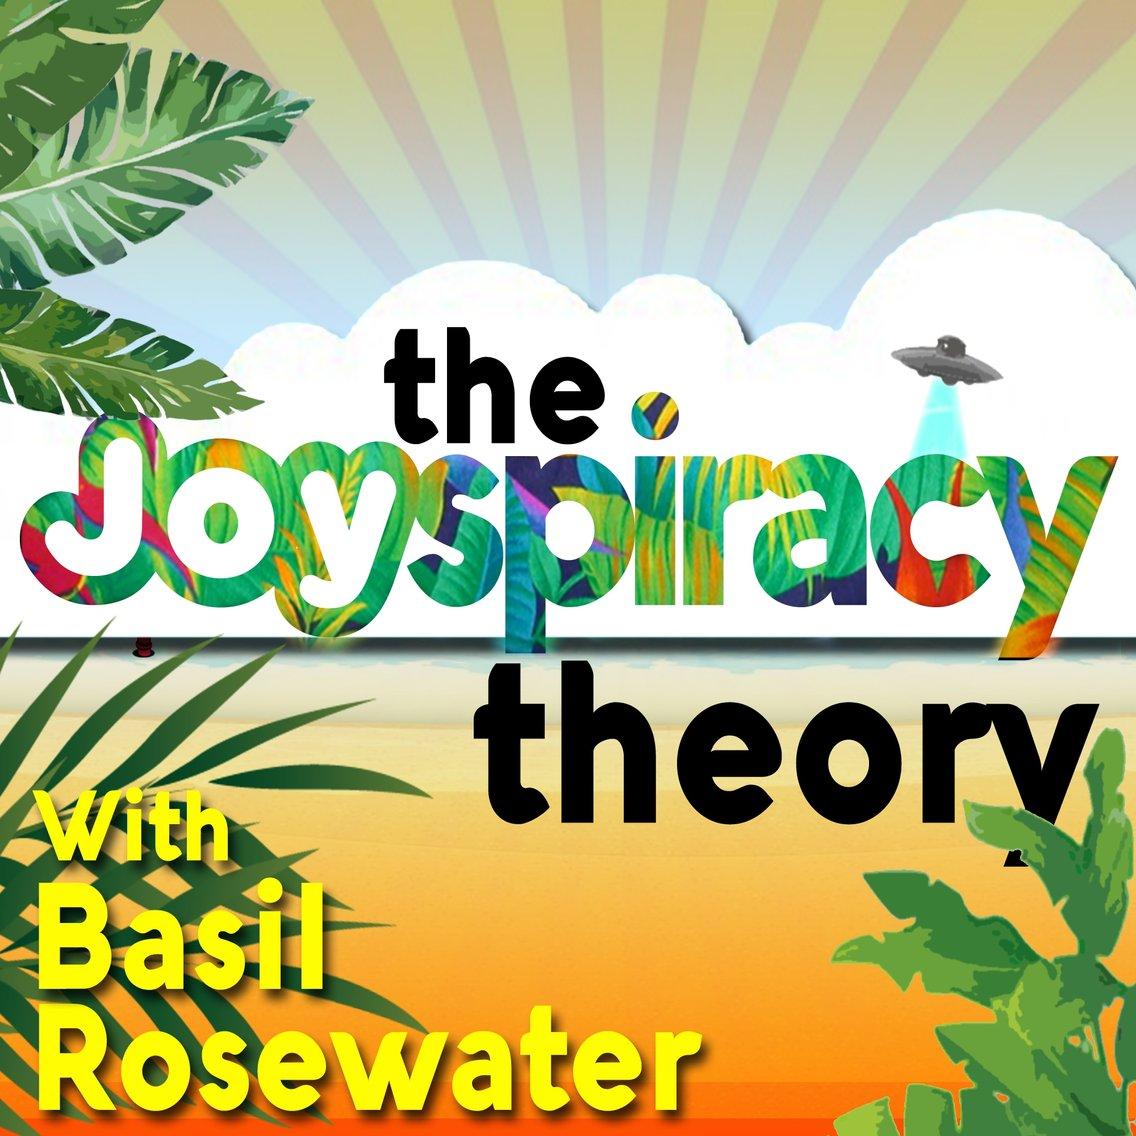 The Joyspiracy Theory - Cover Image